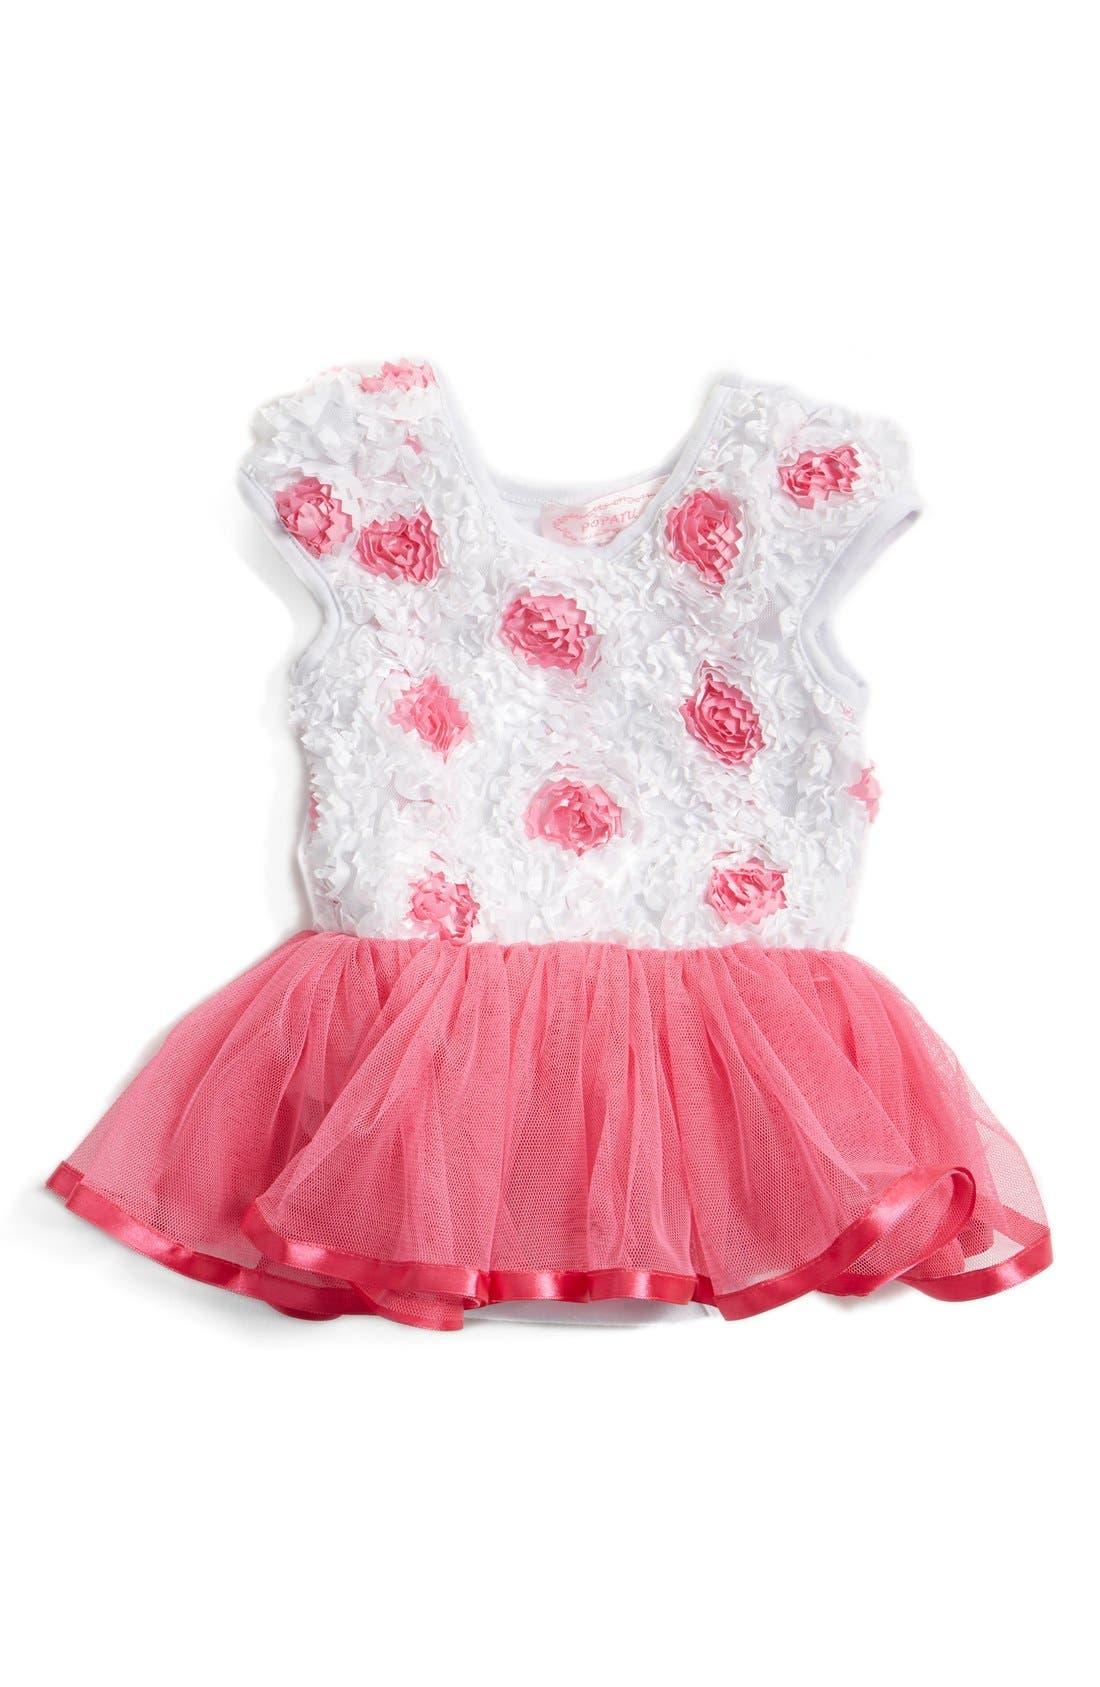 Alternate Image 1 Selected - Popatu Soutache Floral Tutu Dress (Baby Girls)